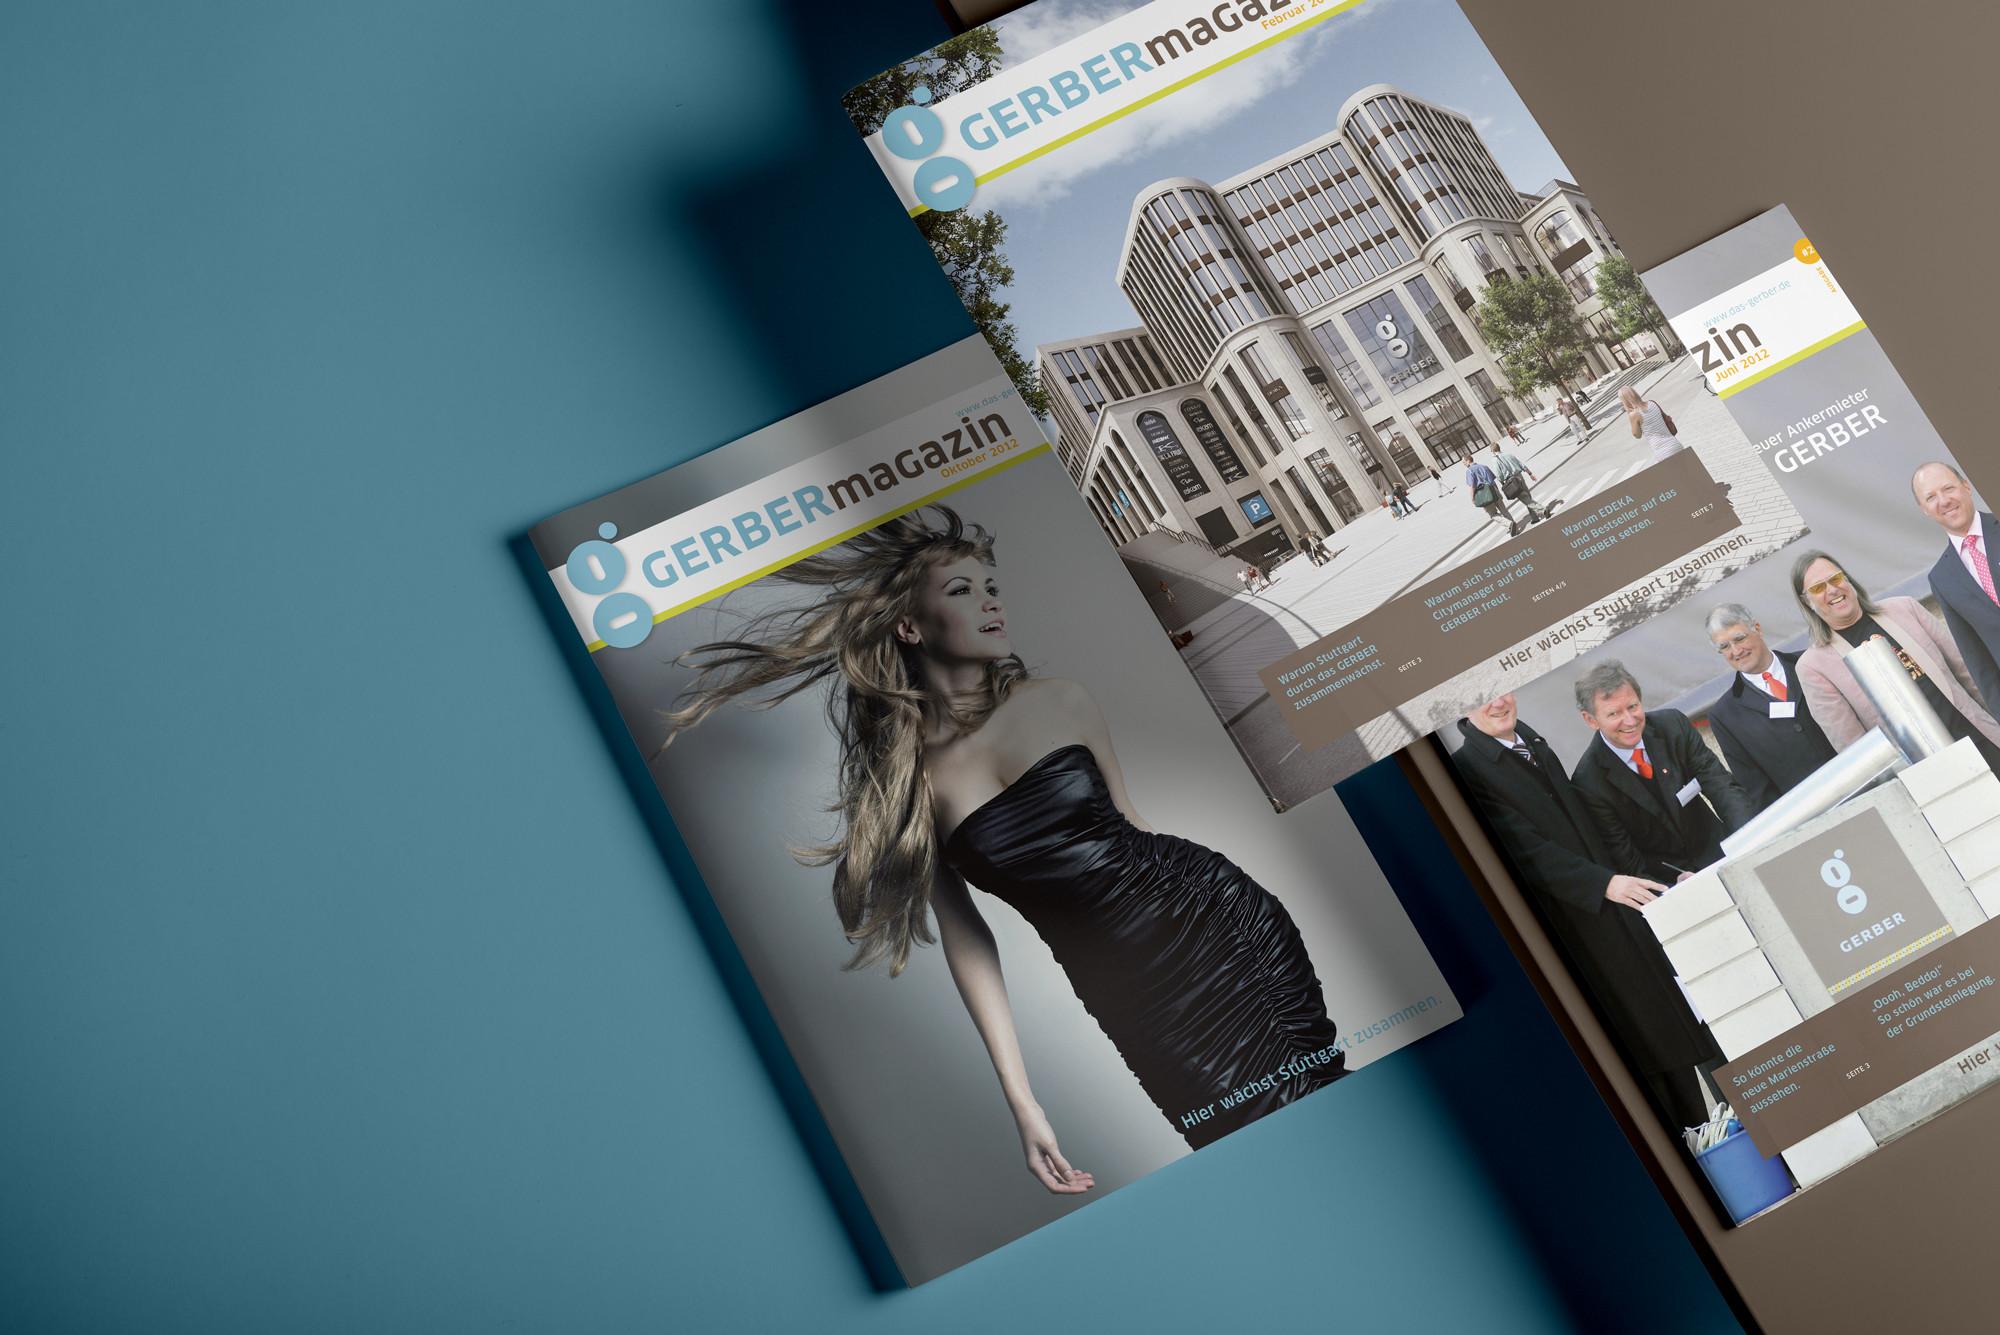 Gerber Magazin